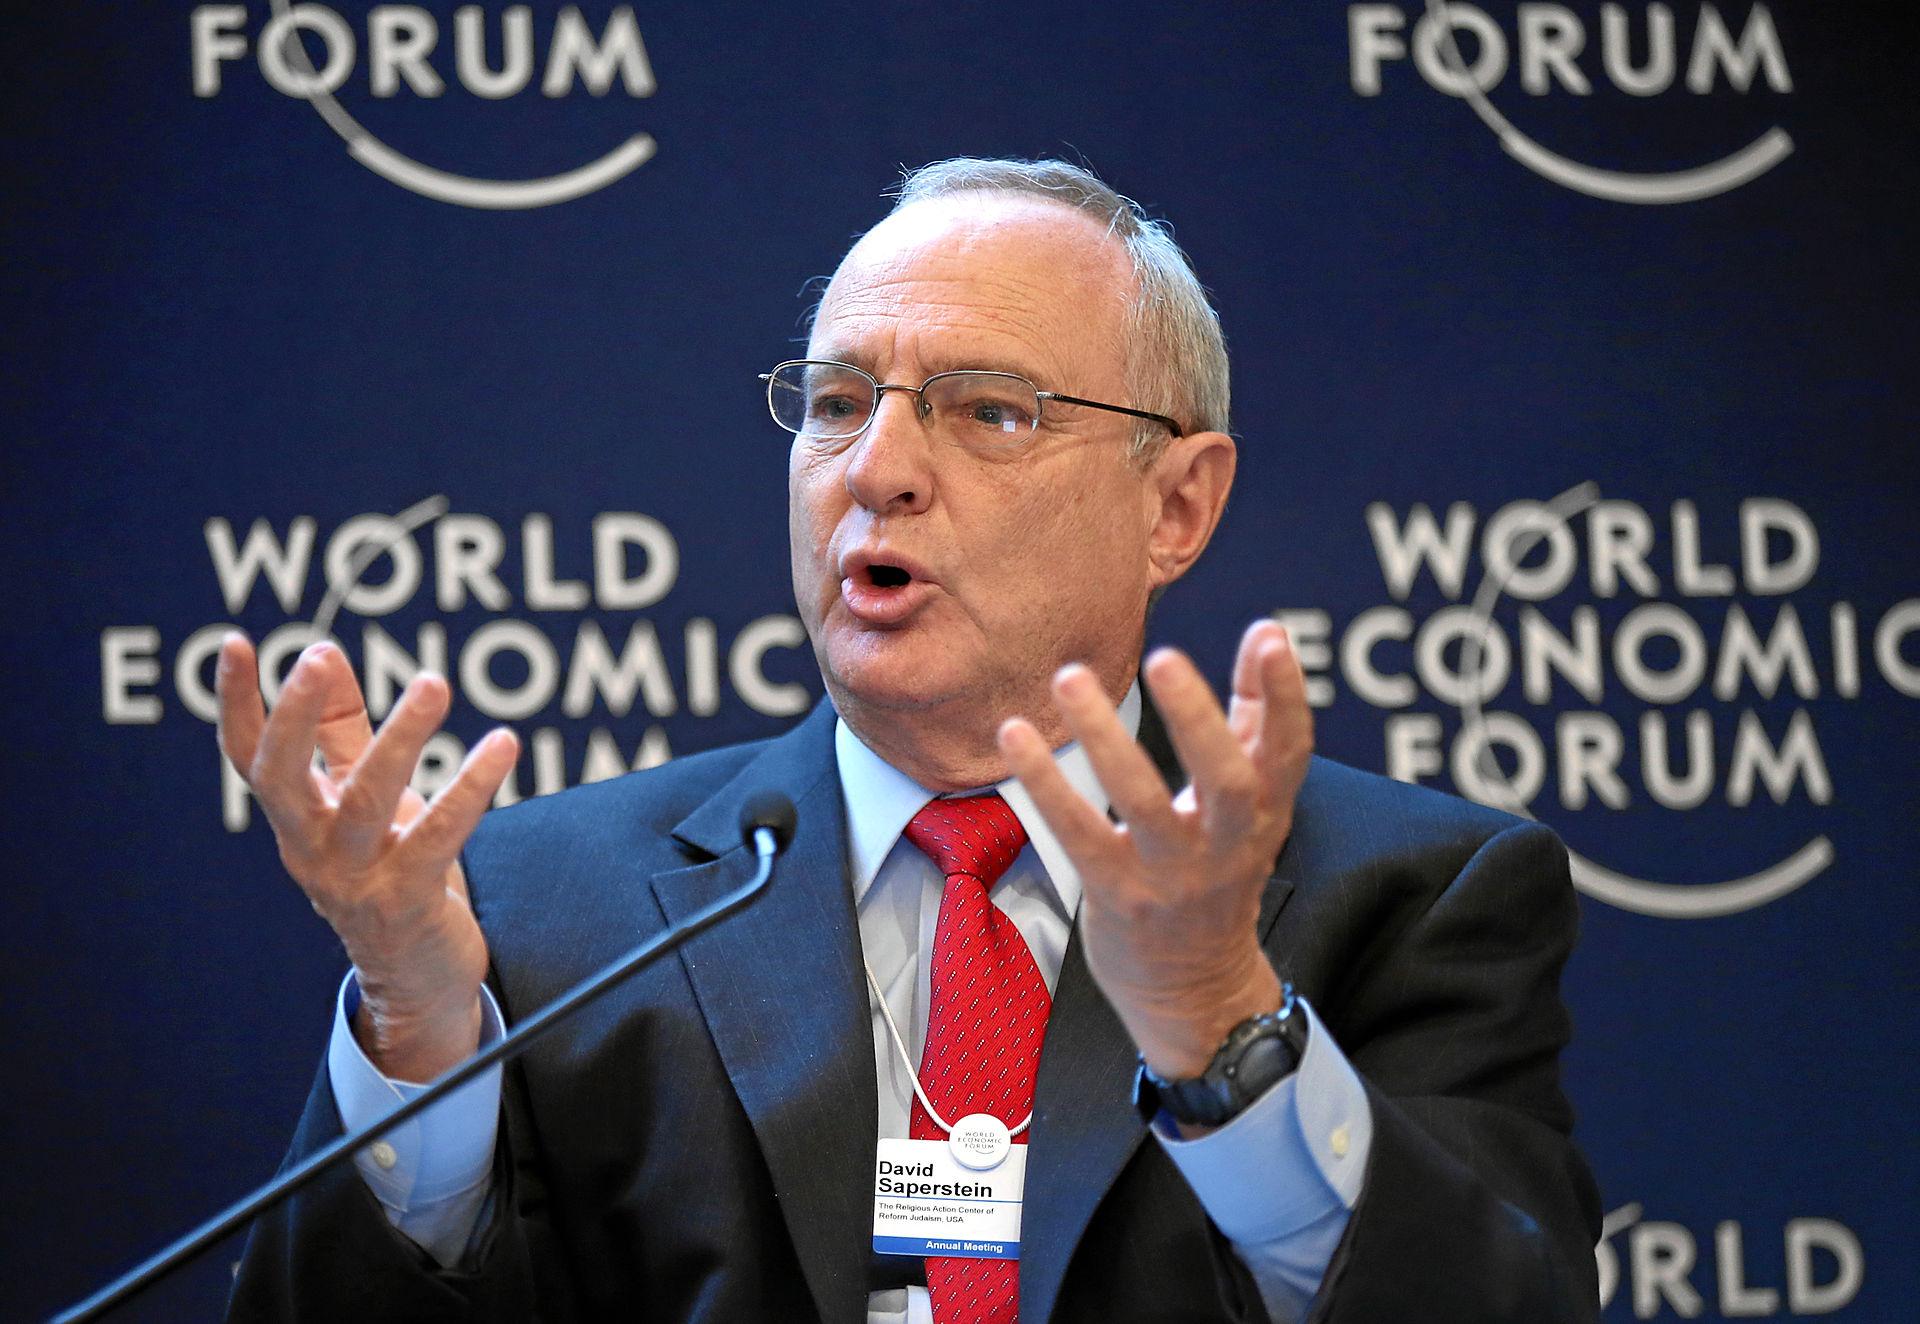 Photo Credit: Flickr/World Economic Forum